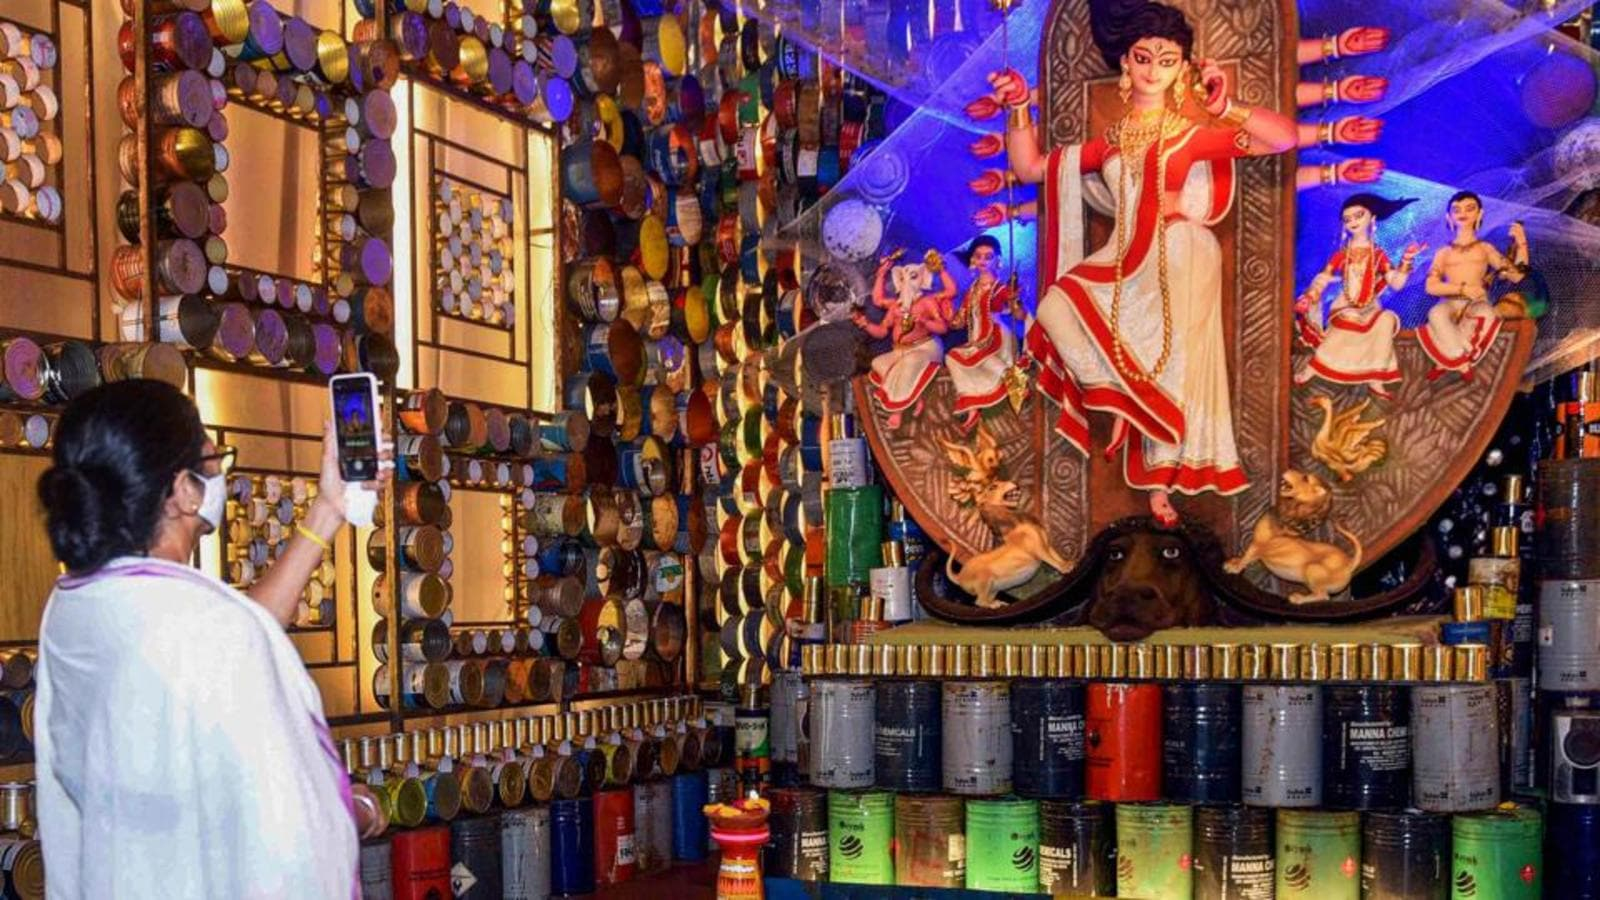 Bengal CM Mamata Banerjee to inaugurate Durga puja pandals